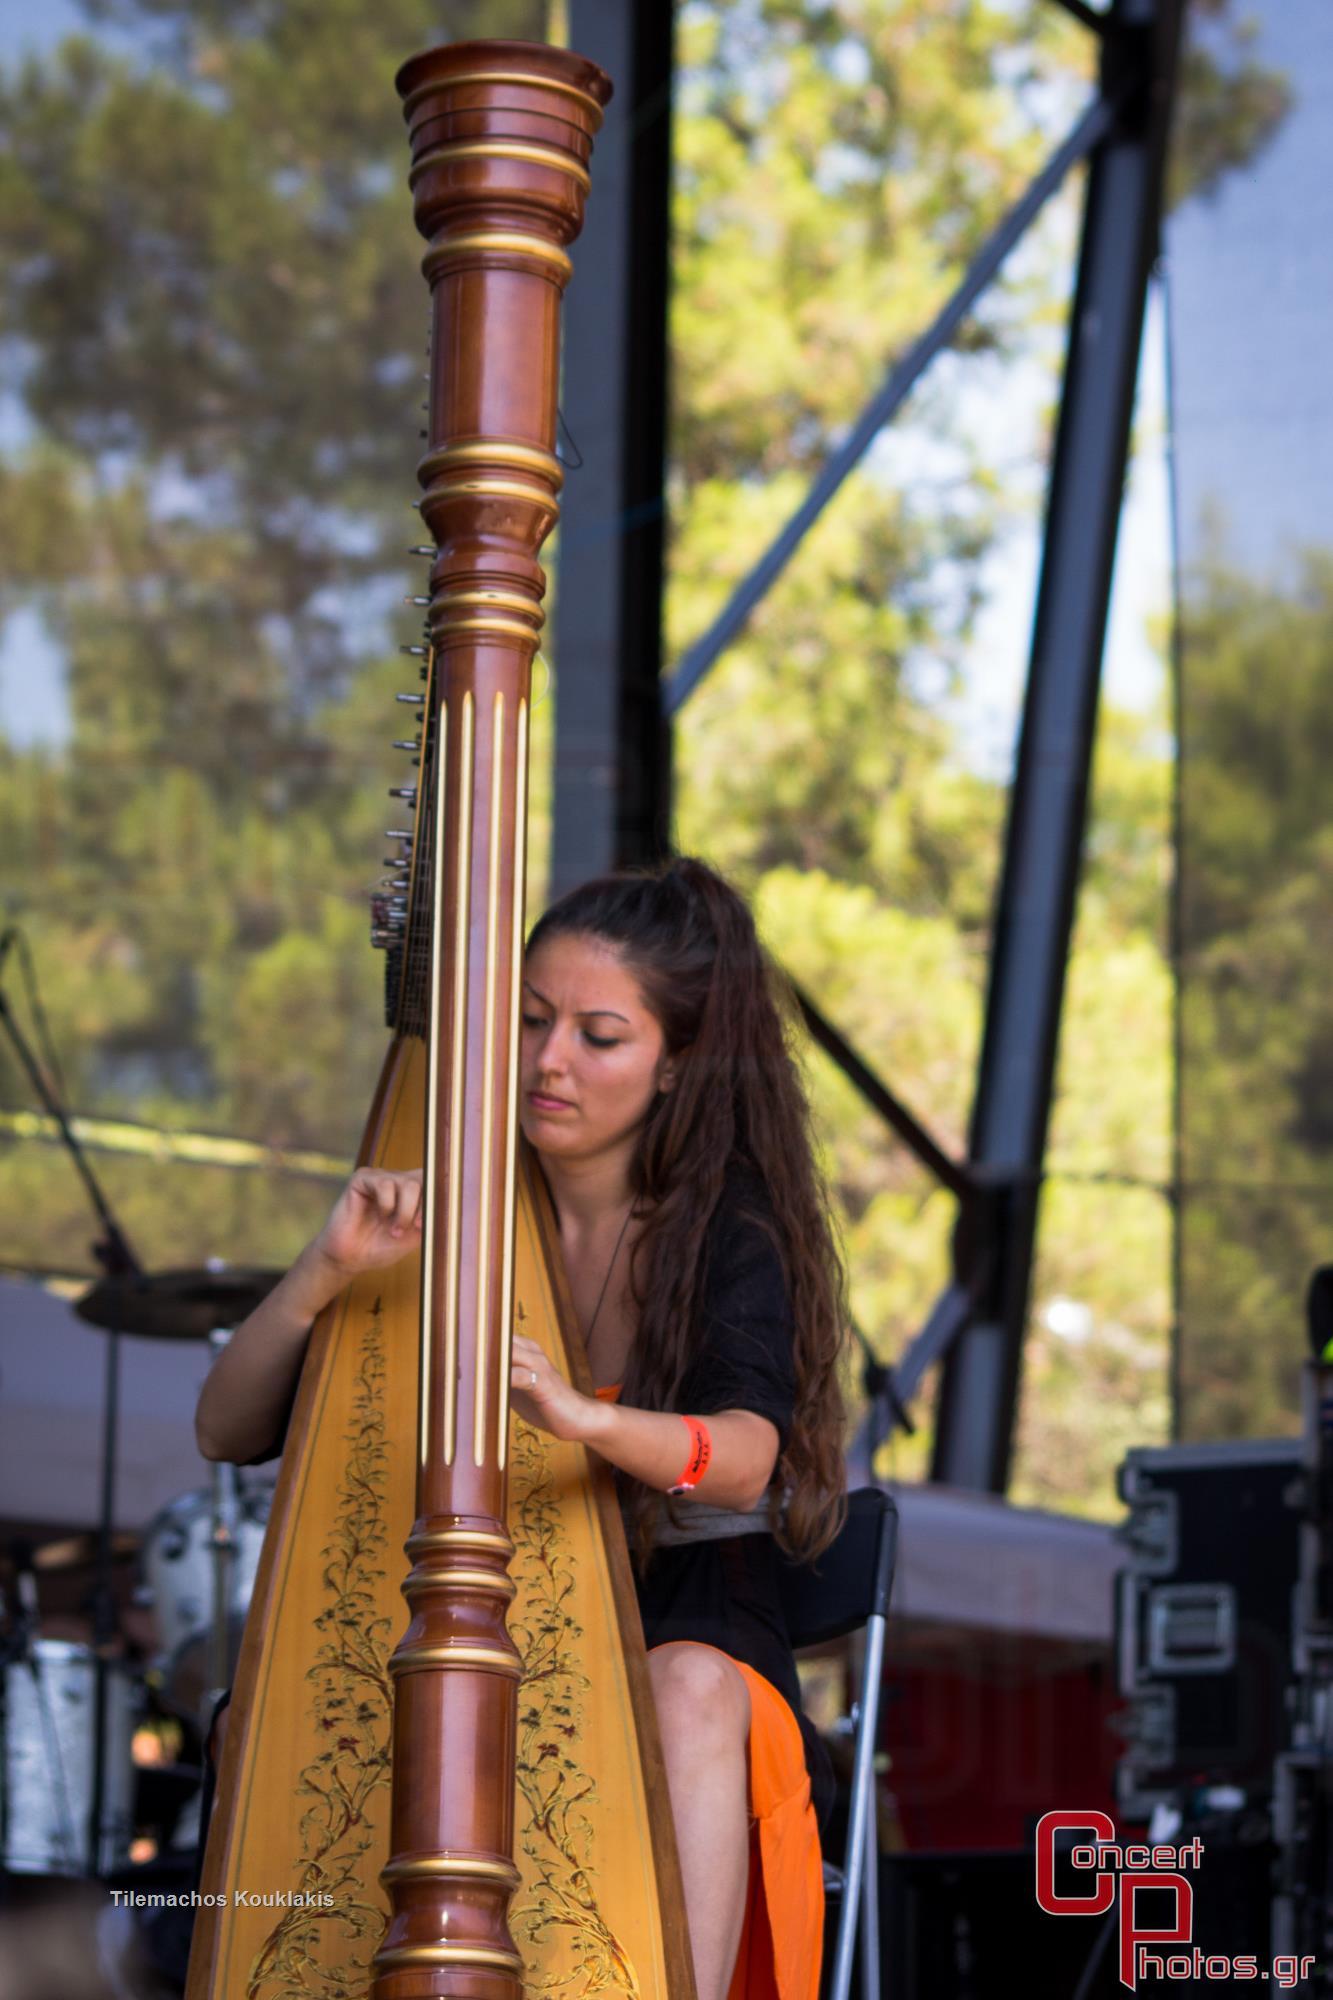 Opera Chaotique-Opera Chaotique photographer: Tilemachos Kouklakis - concertphotos_-0020